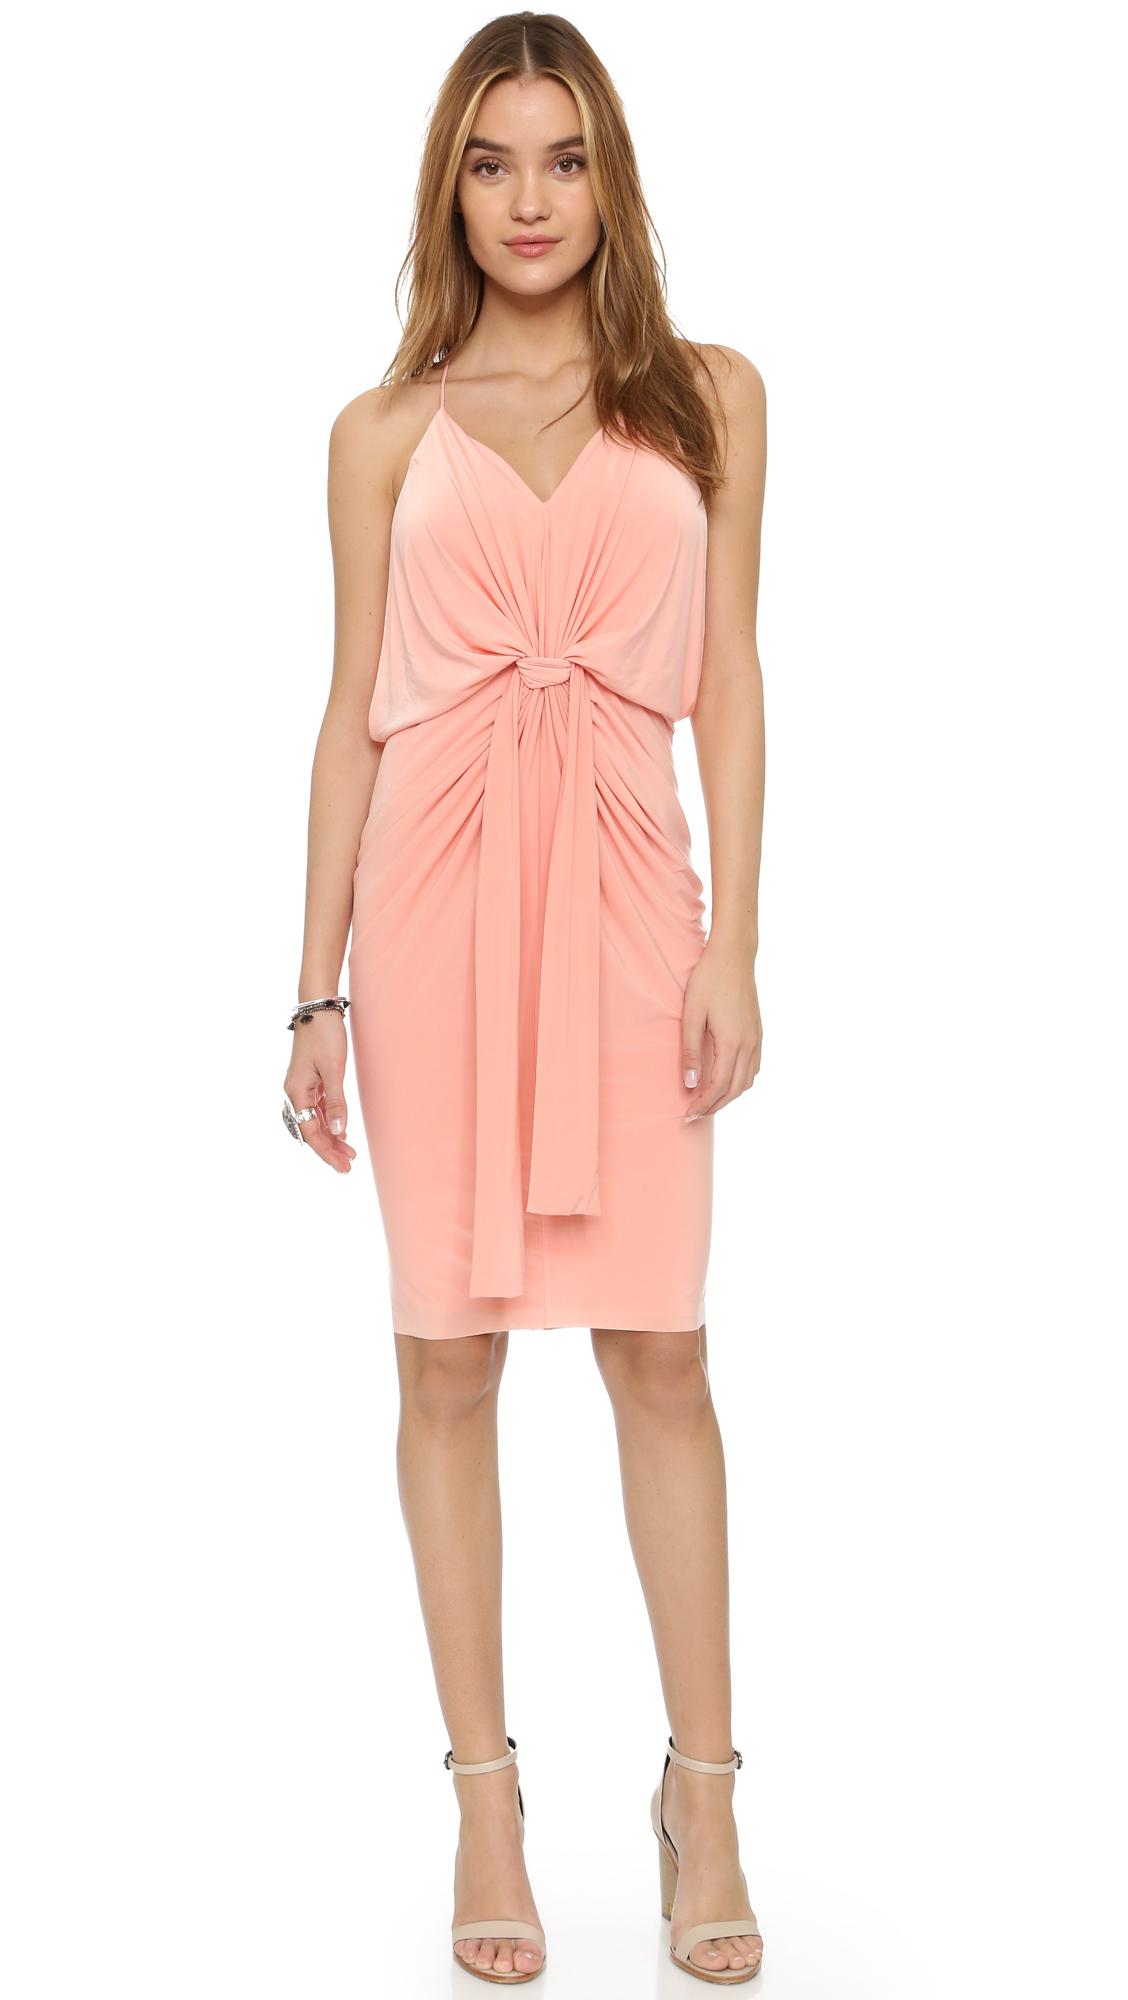 Blush Pink Knee Length Dress